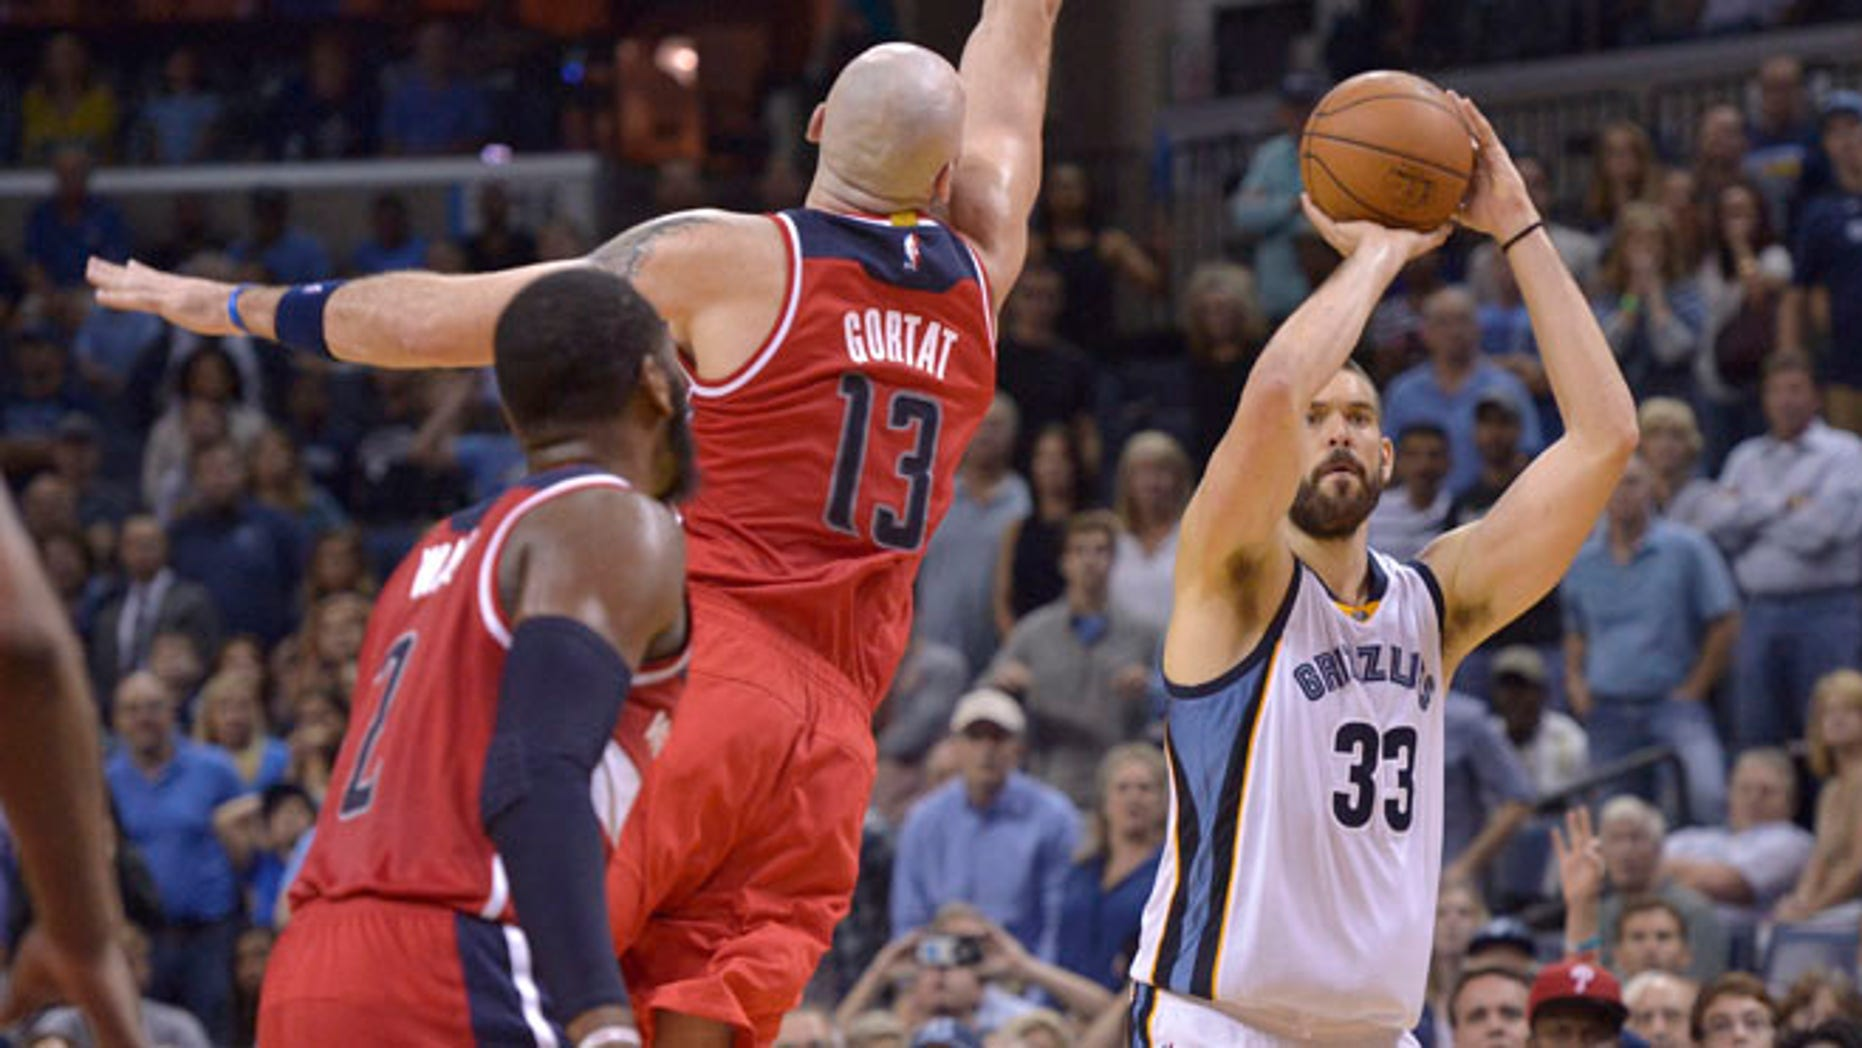 Gasol shoots a three-pointer against Washington Wizards Oct. 30, 2016, in Memphis, Tenn.